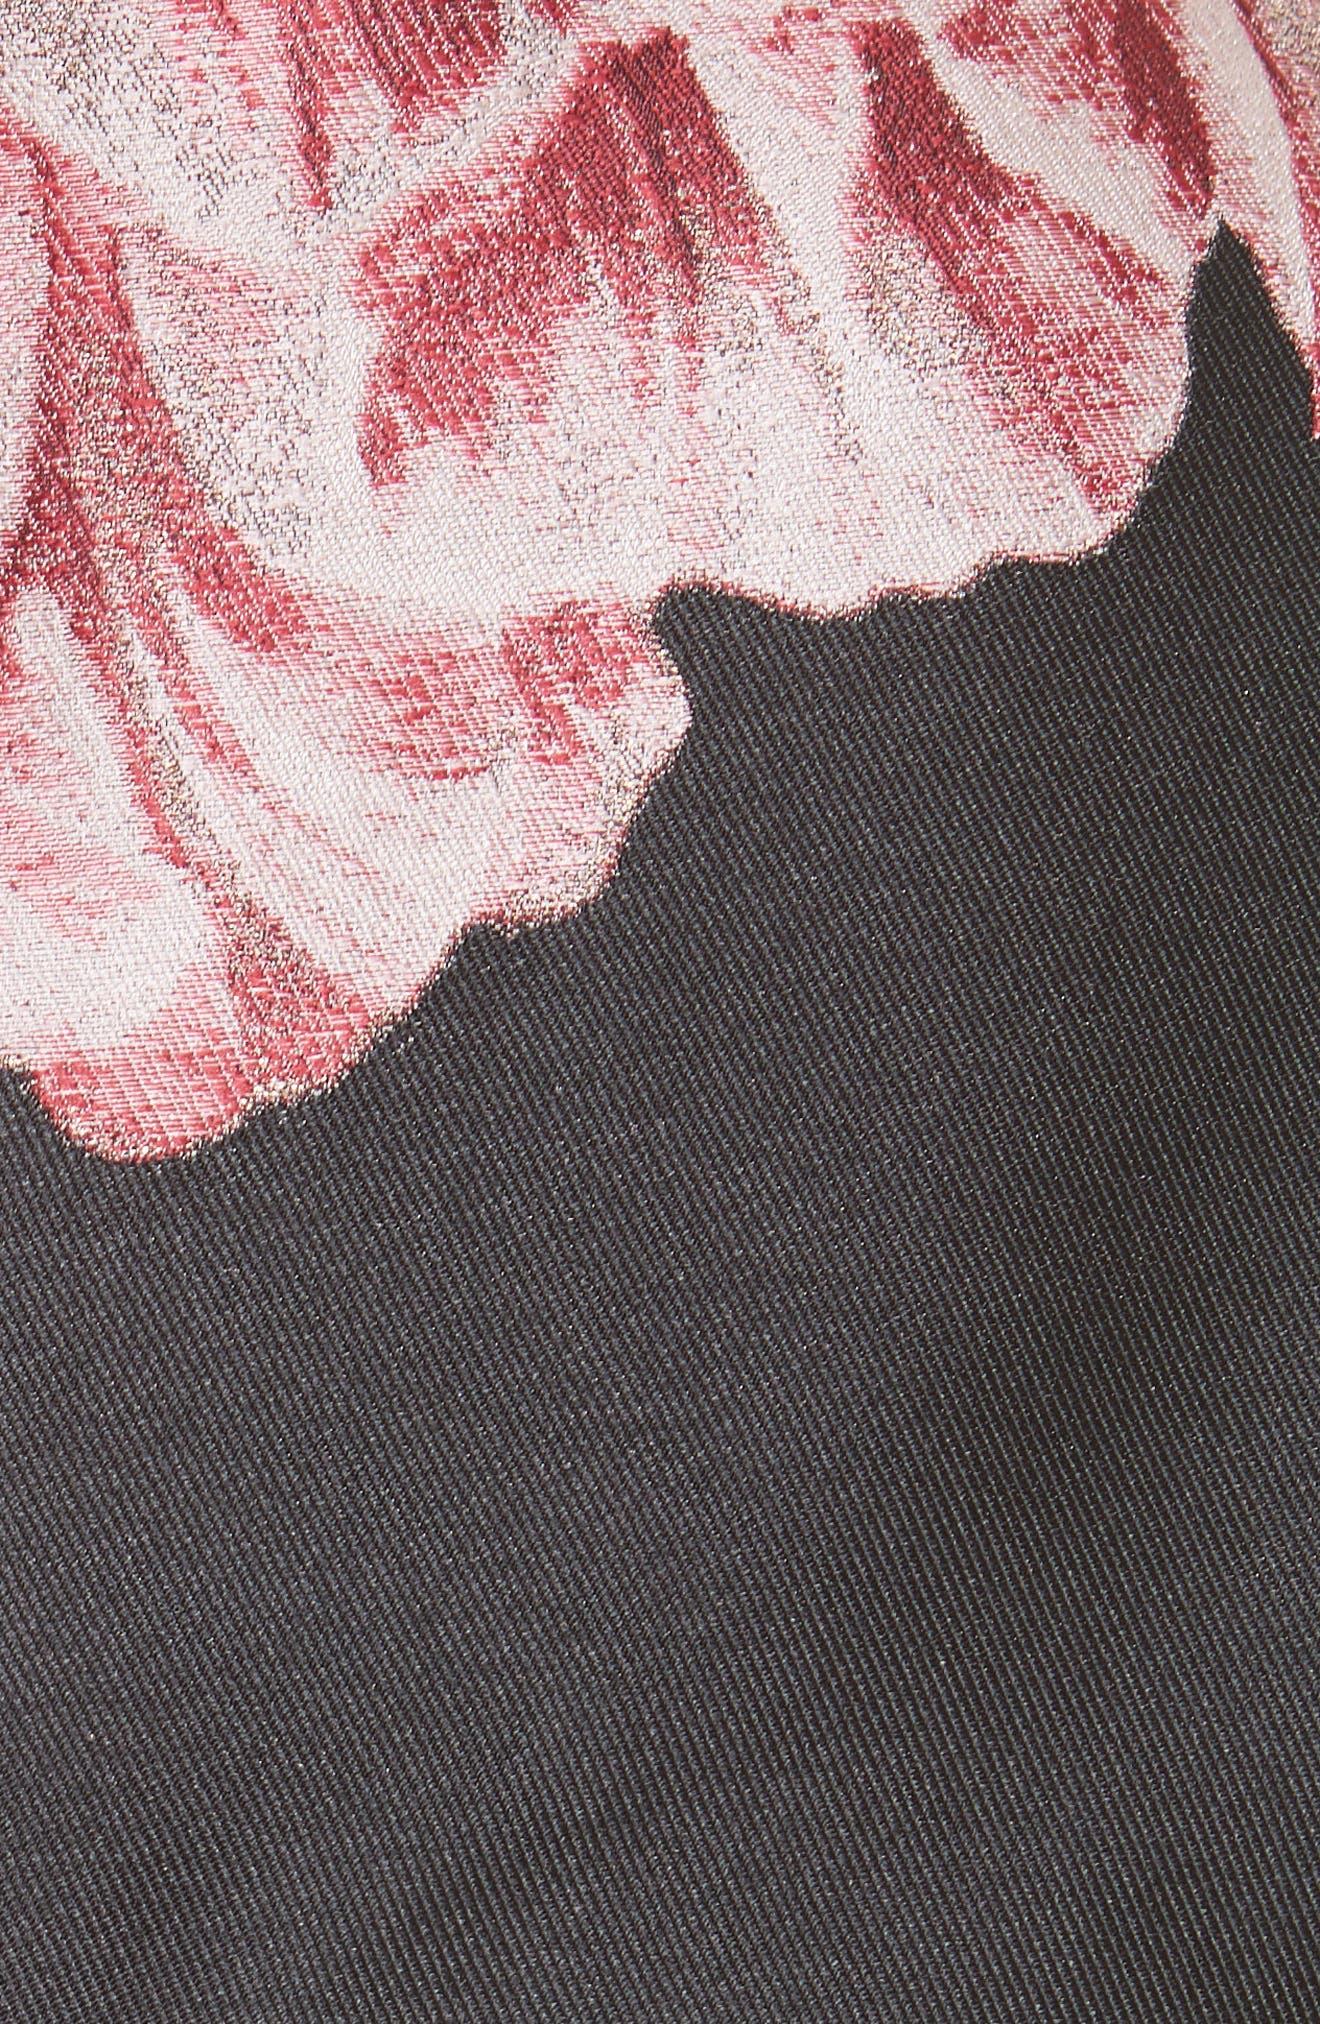 Eyvii Bay of Honour Asymmetrical Dress,                             Alternate thumbnail 6, color,                             001